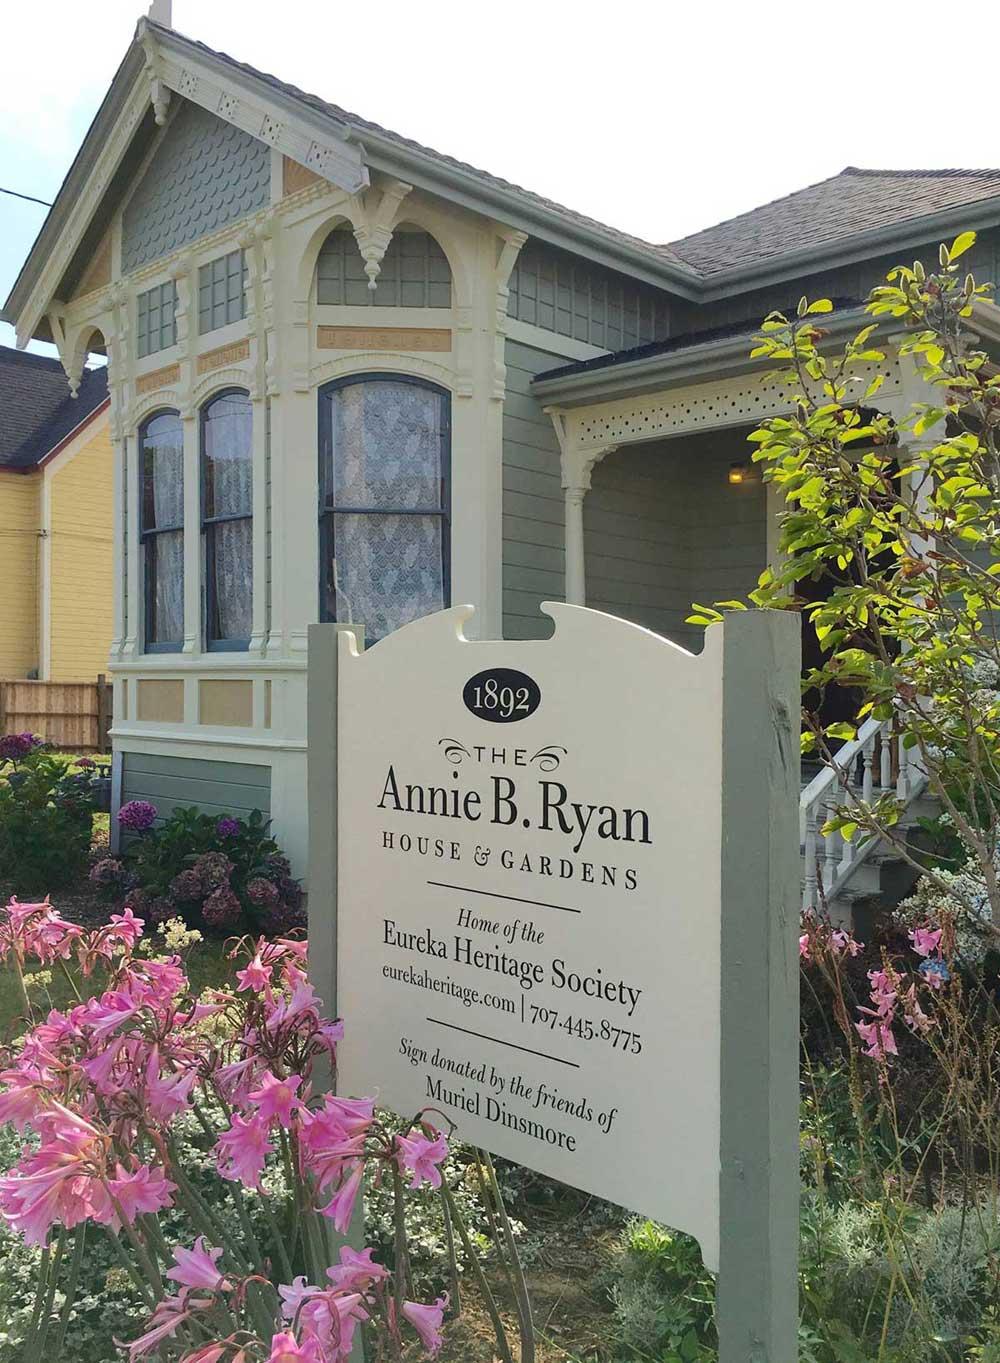 Annie B. Ryan House & Gardens